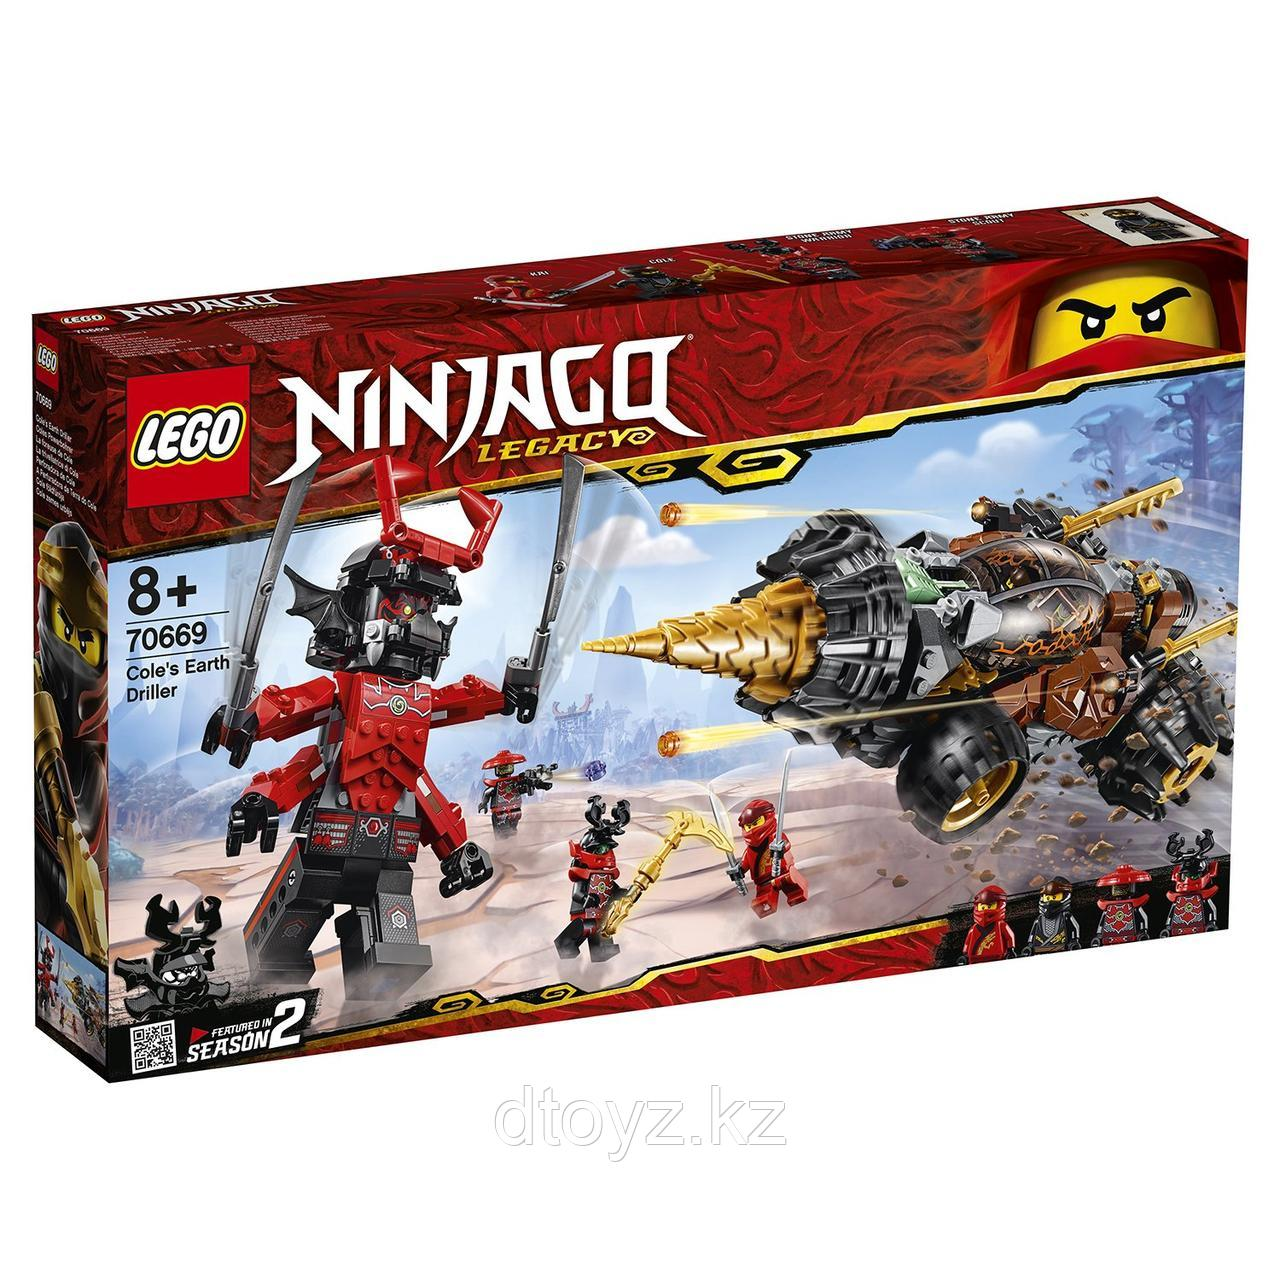 Lego Ninjago 70669 Земляной бур Коула